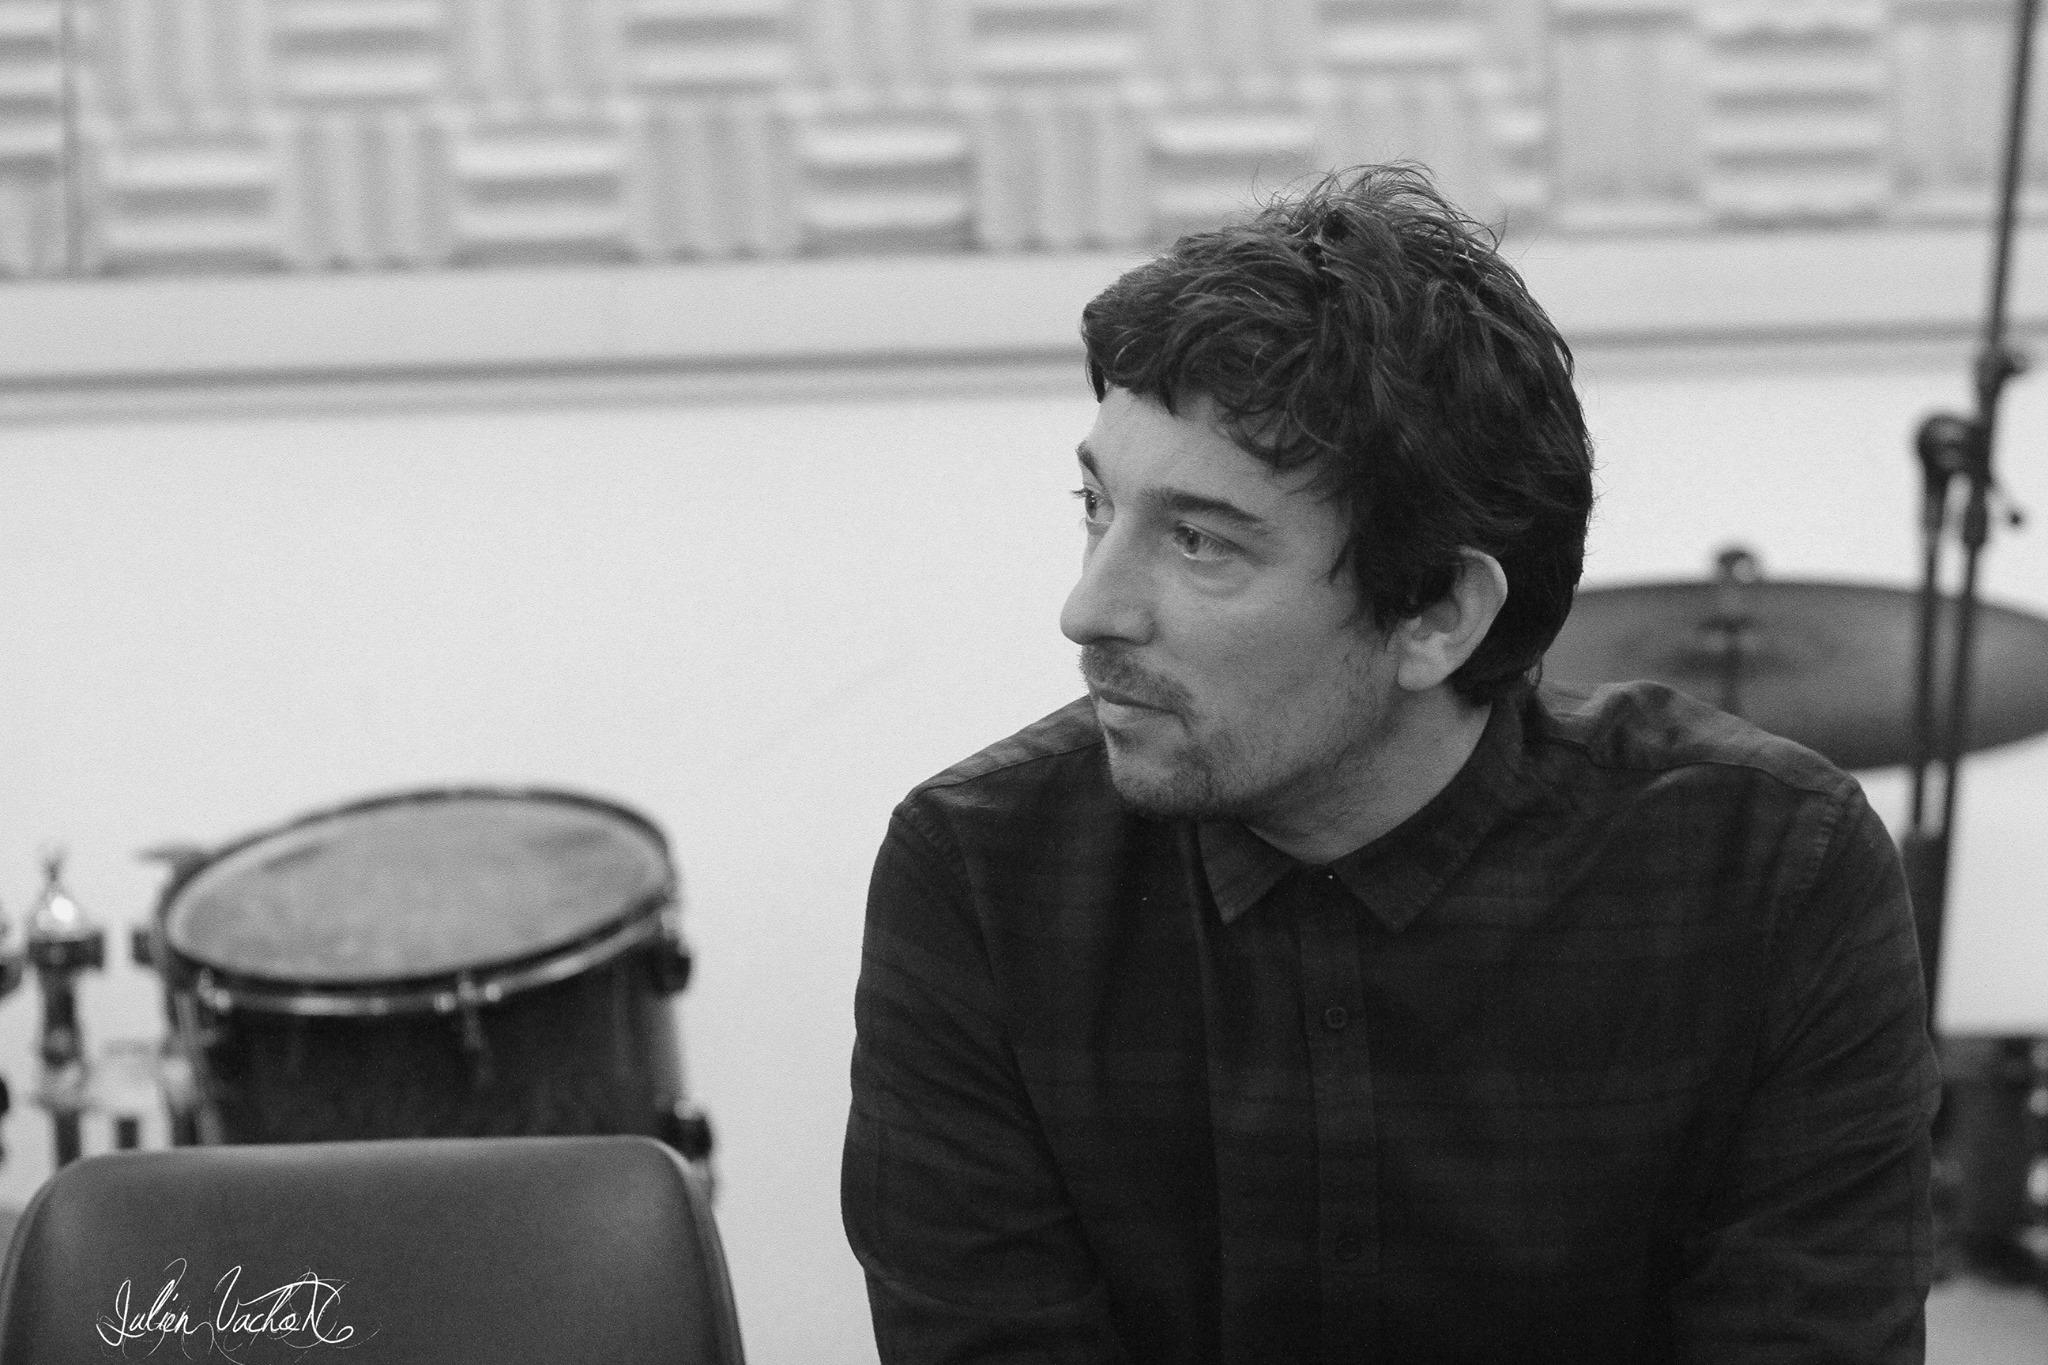 Vincent Boivin – Arista France / Sony Music France